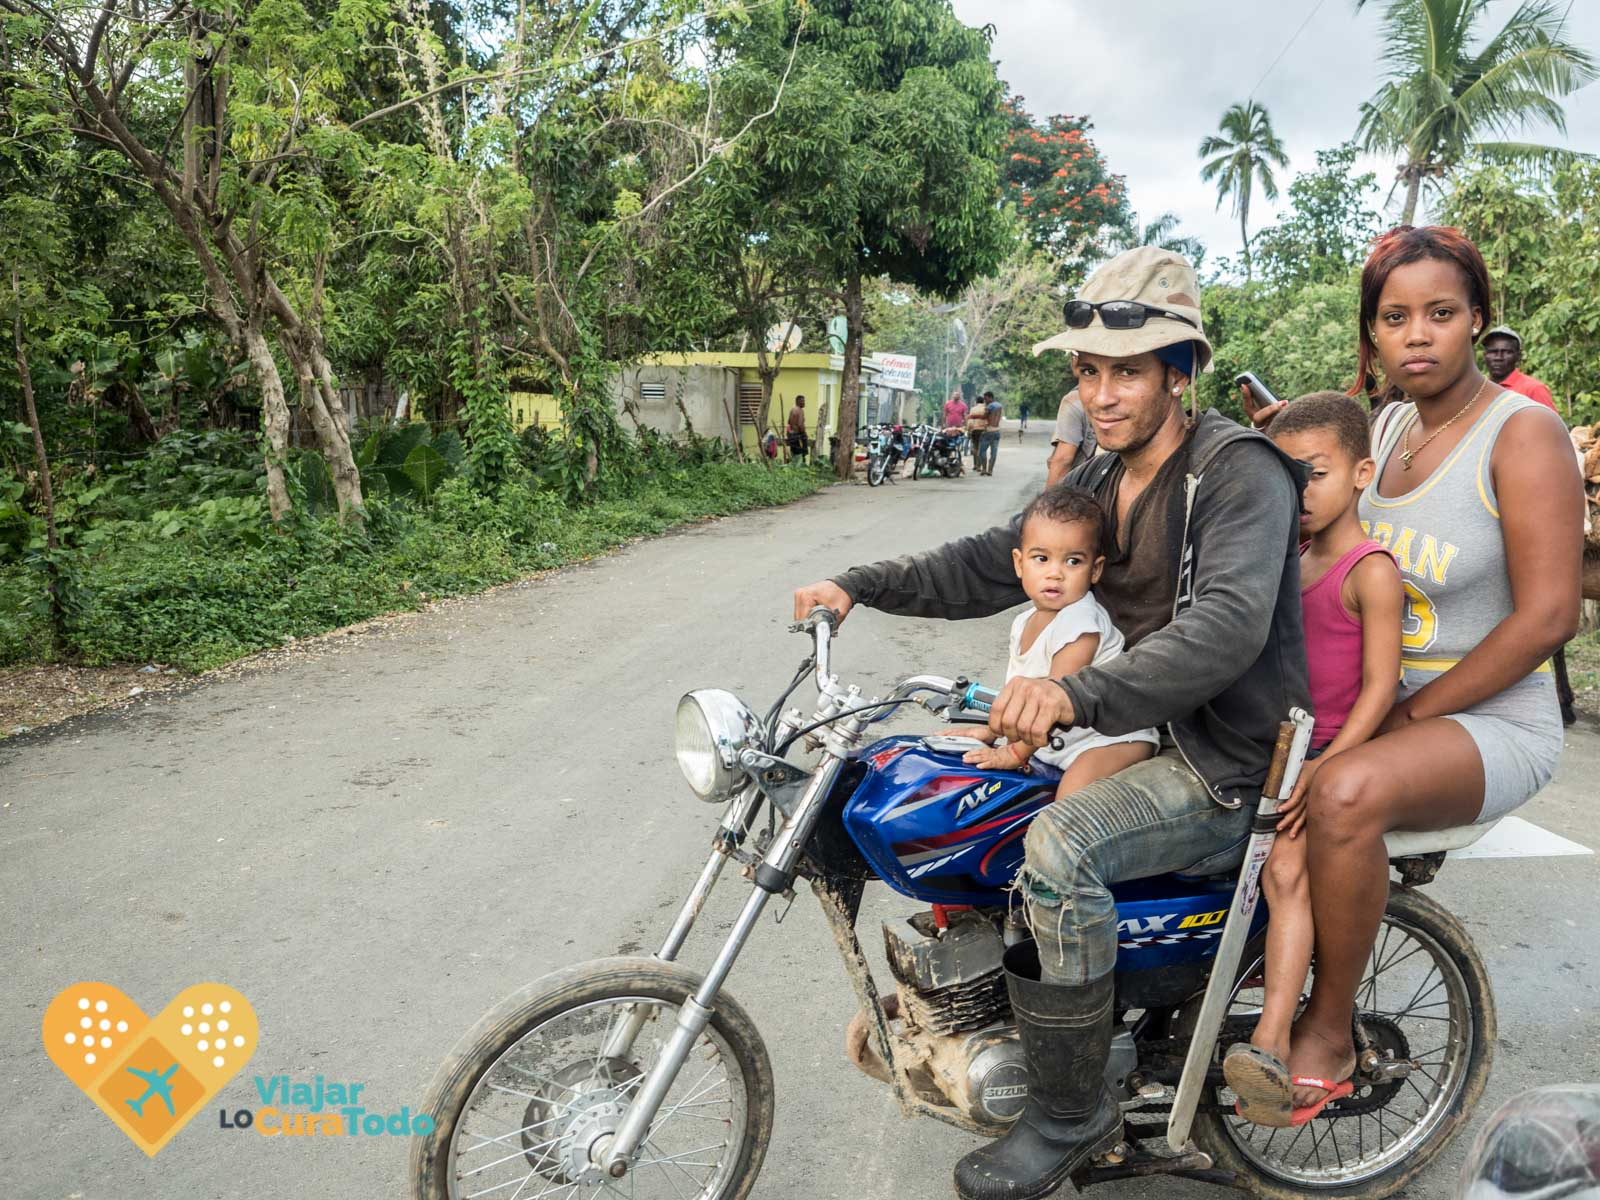 conducción motocicletas república dominicana